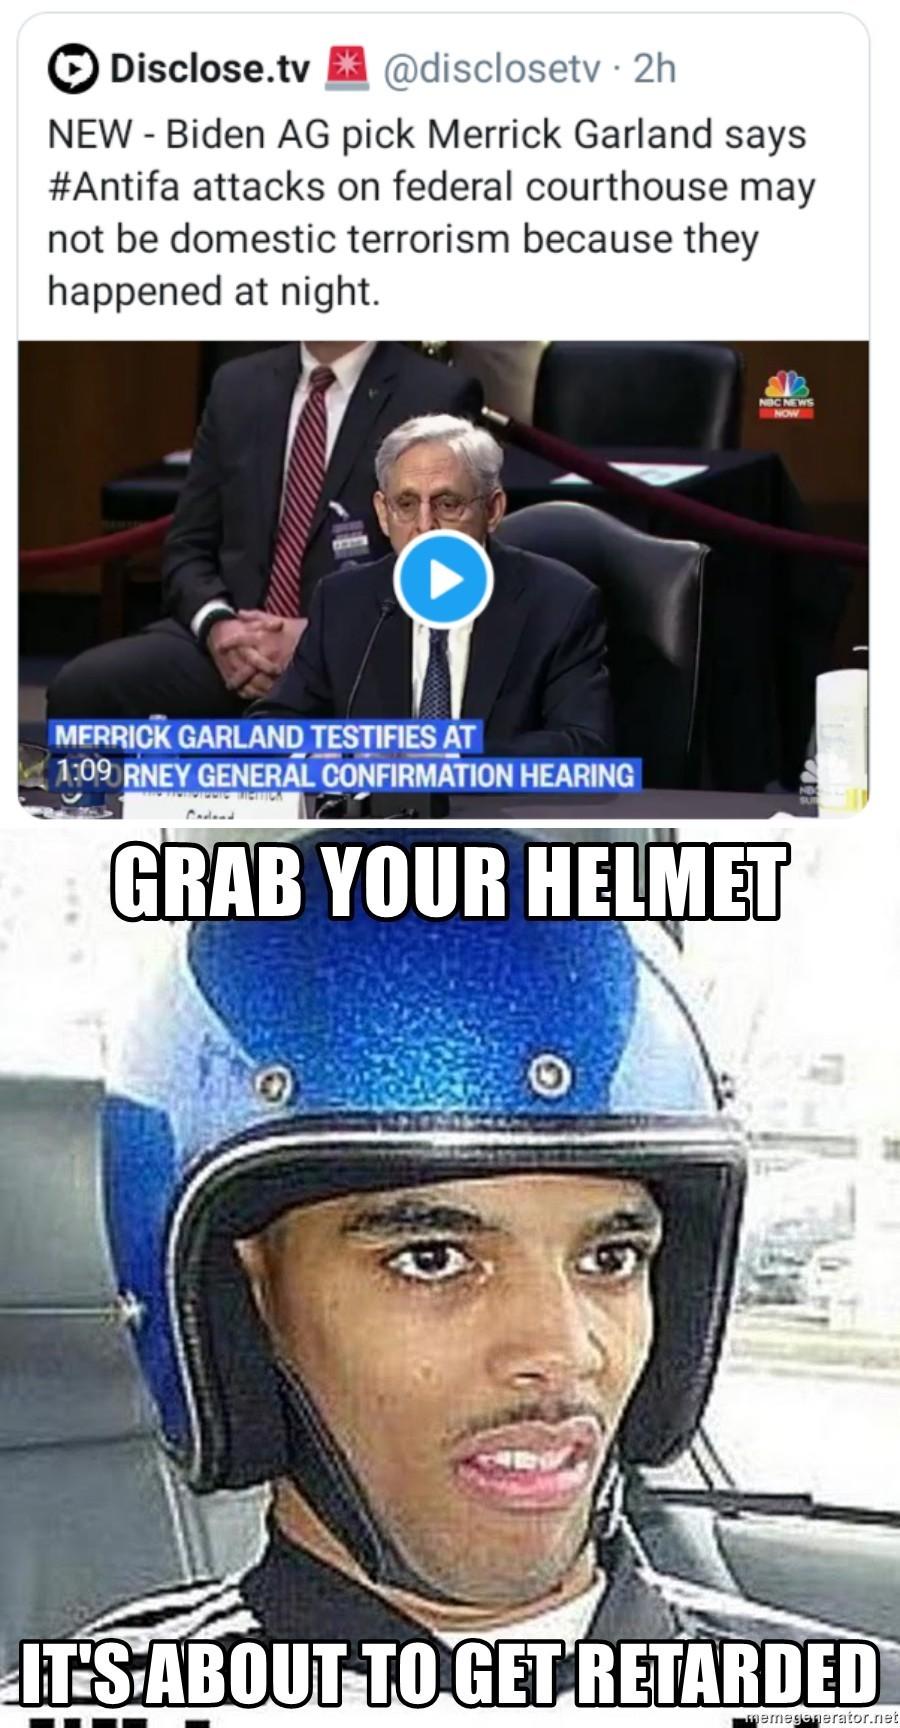 And this is why it is a good thing he isn't on SCOTUS - meme